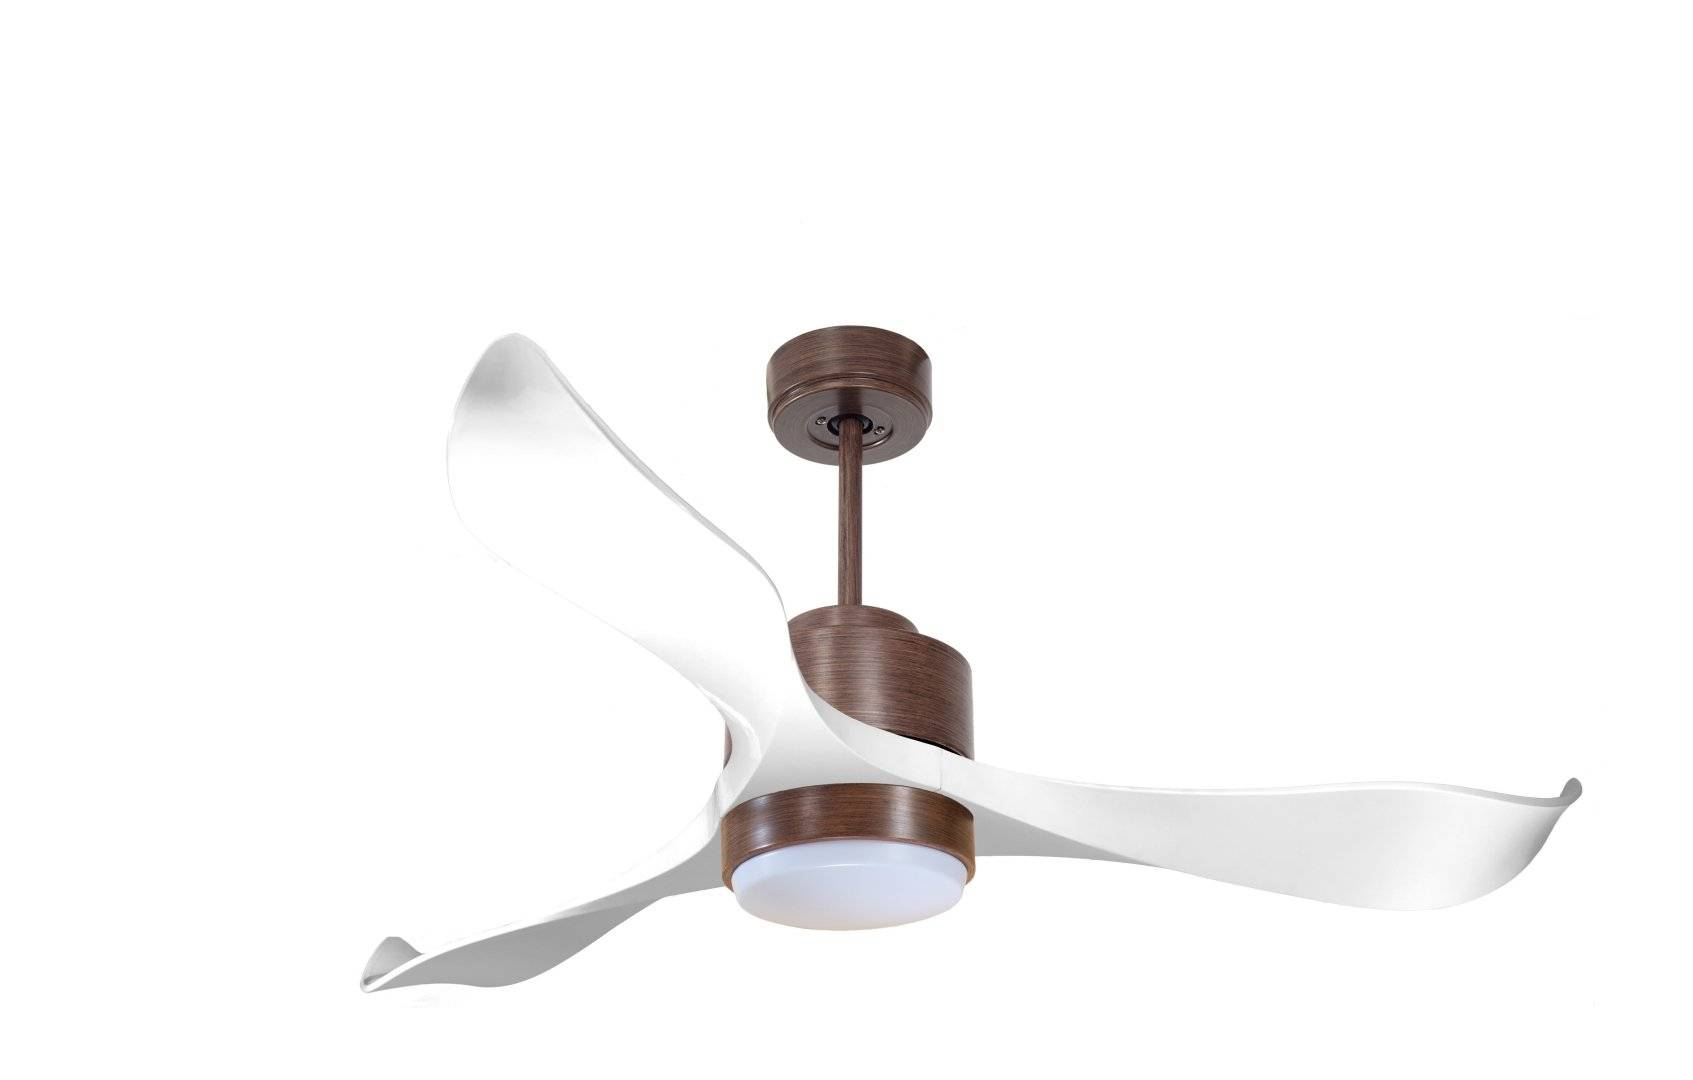 KlassFan Modulo by KlassFan - DC Ceiling Fan with Light Wood and white ideal for 25 to 40 m² KL_DC2_P2Wi_L1Wo